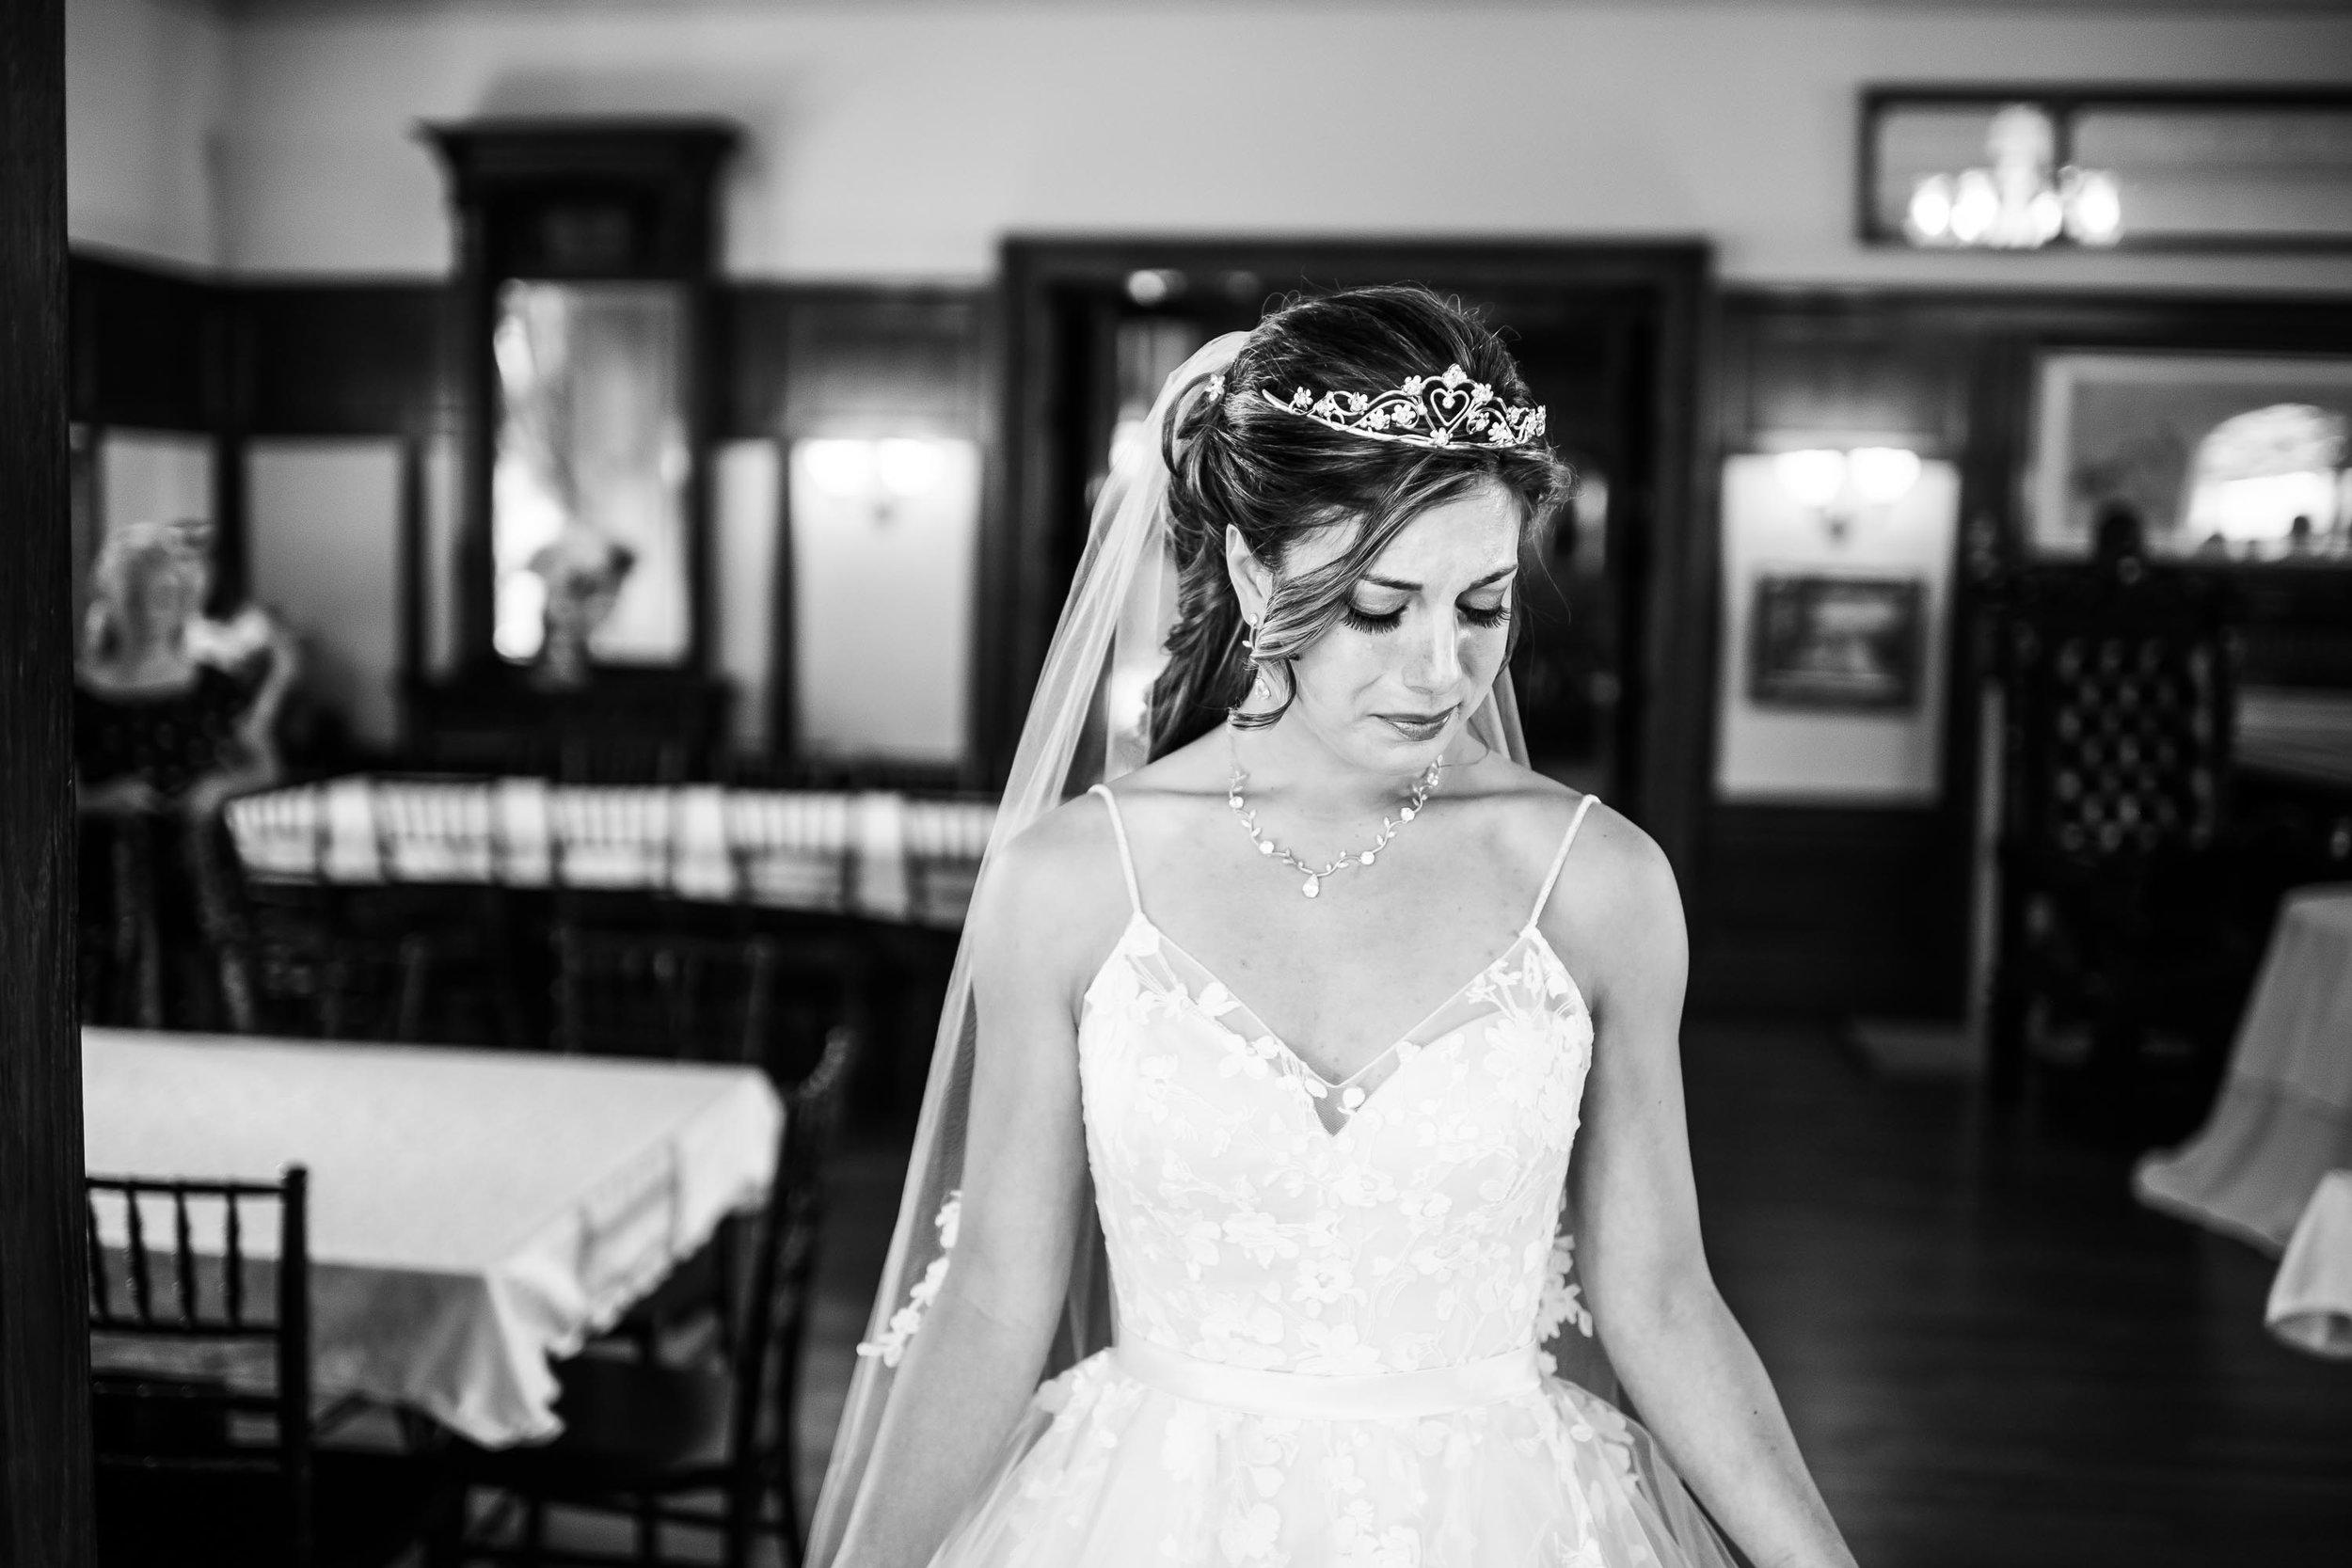 thornewood castle wedding 10.jpg